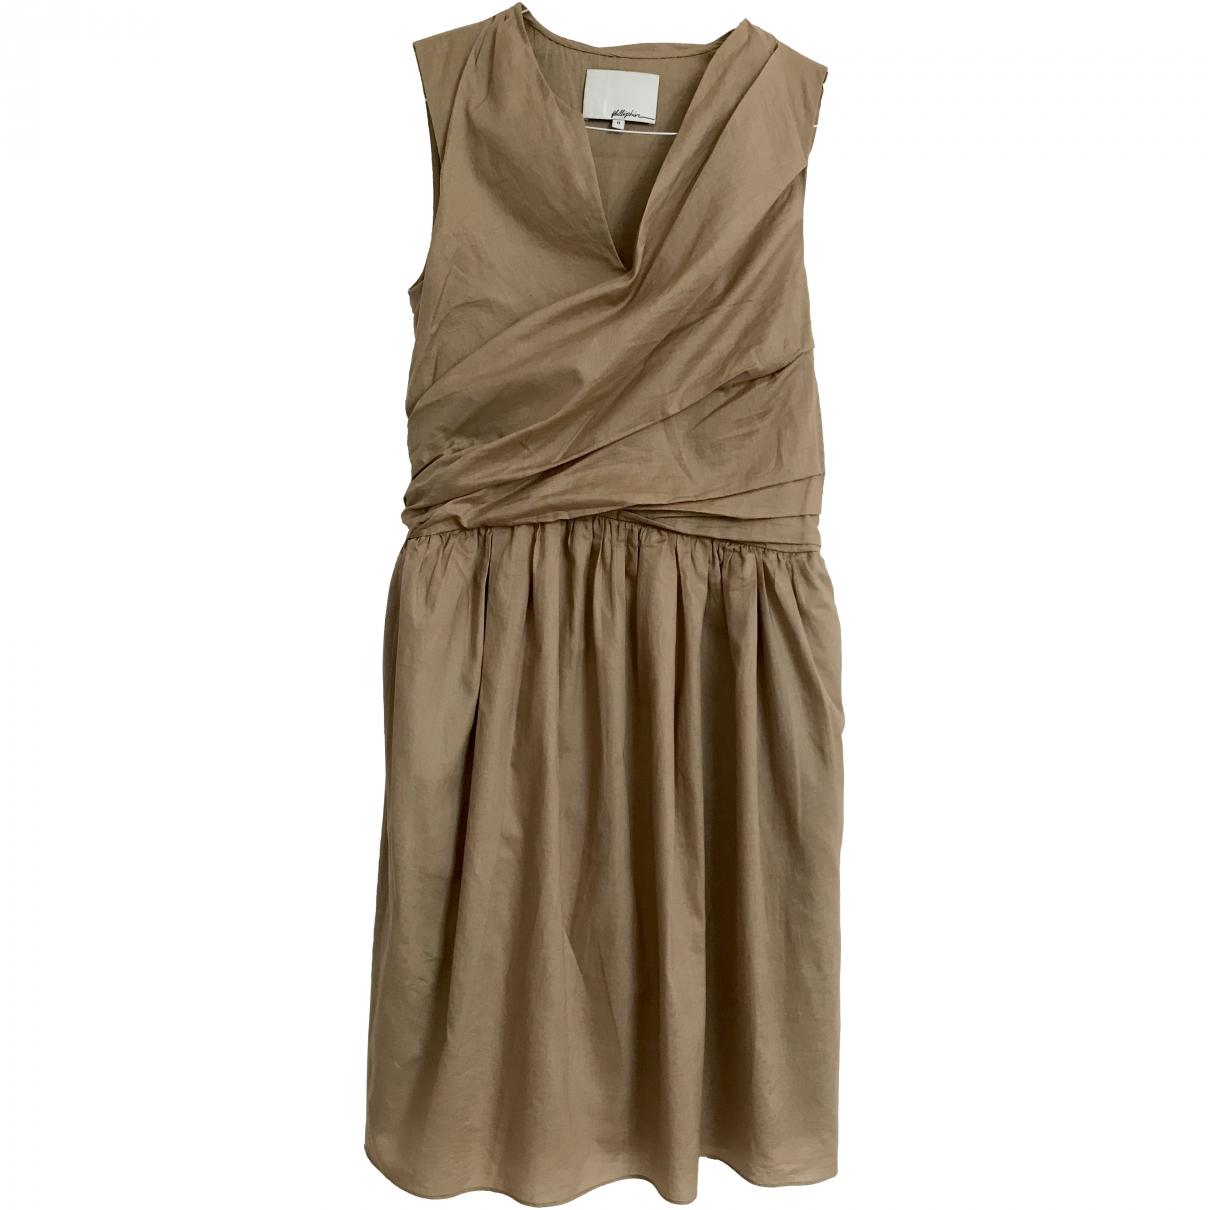 3.1 Phillip Lim \N Beige Cotton dress for Women 0 0-5